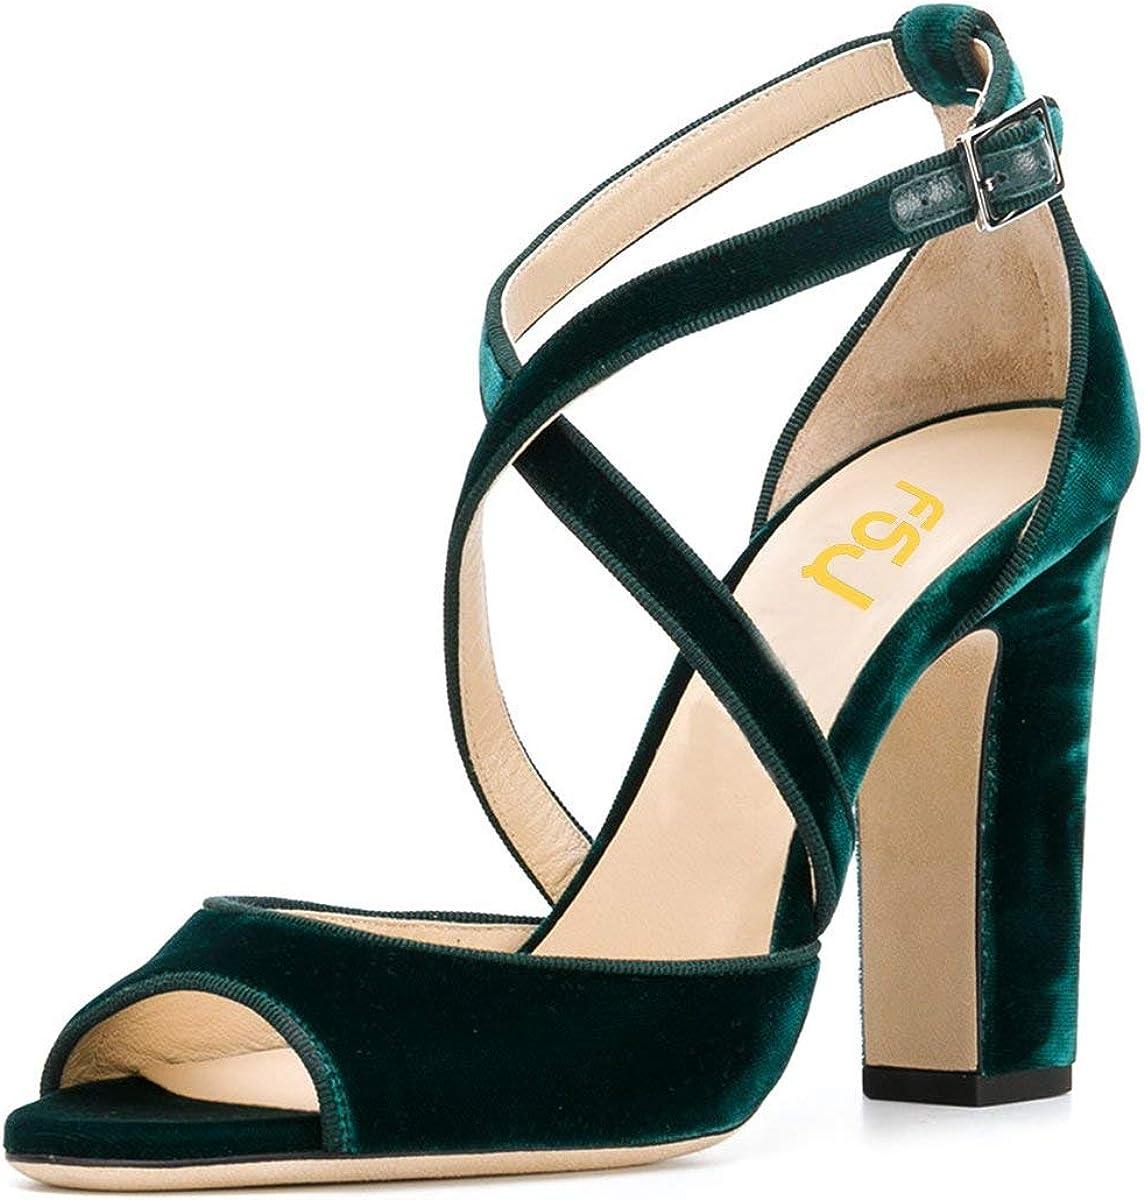 FSJ Women Elegant Award-winning store Ranking TOP5 Peep Toe Sandals Chunky Cross High Heel Pumps